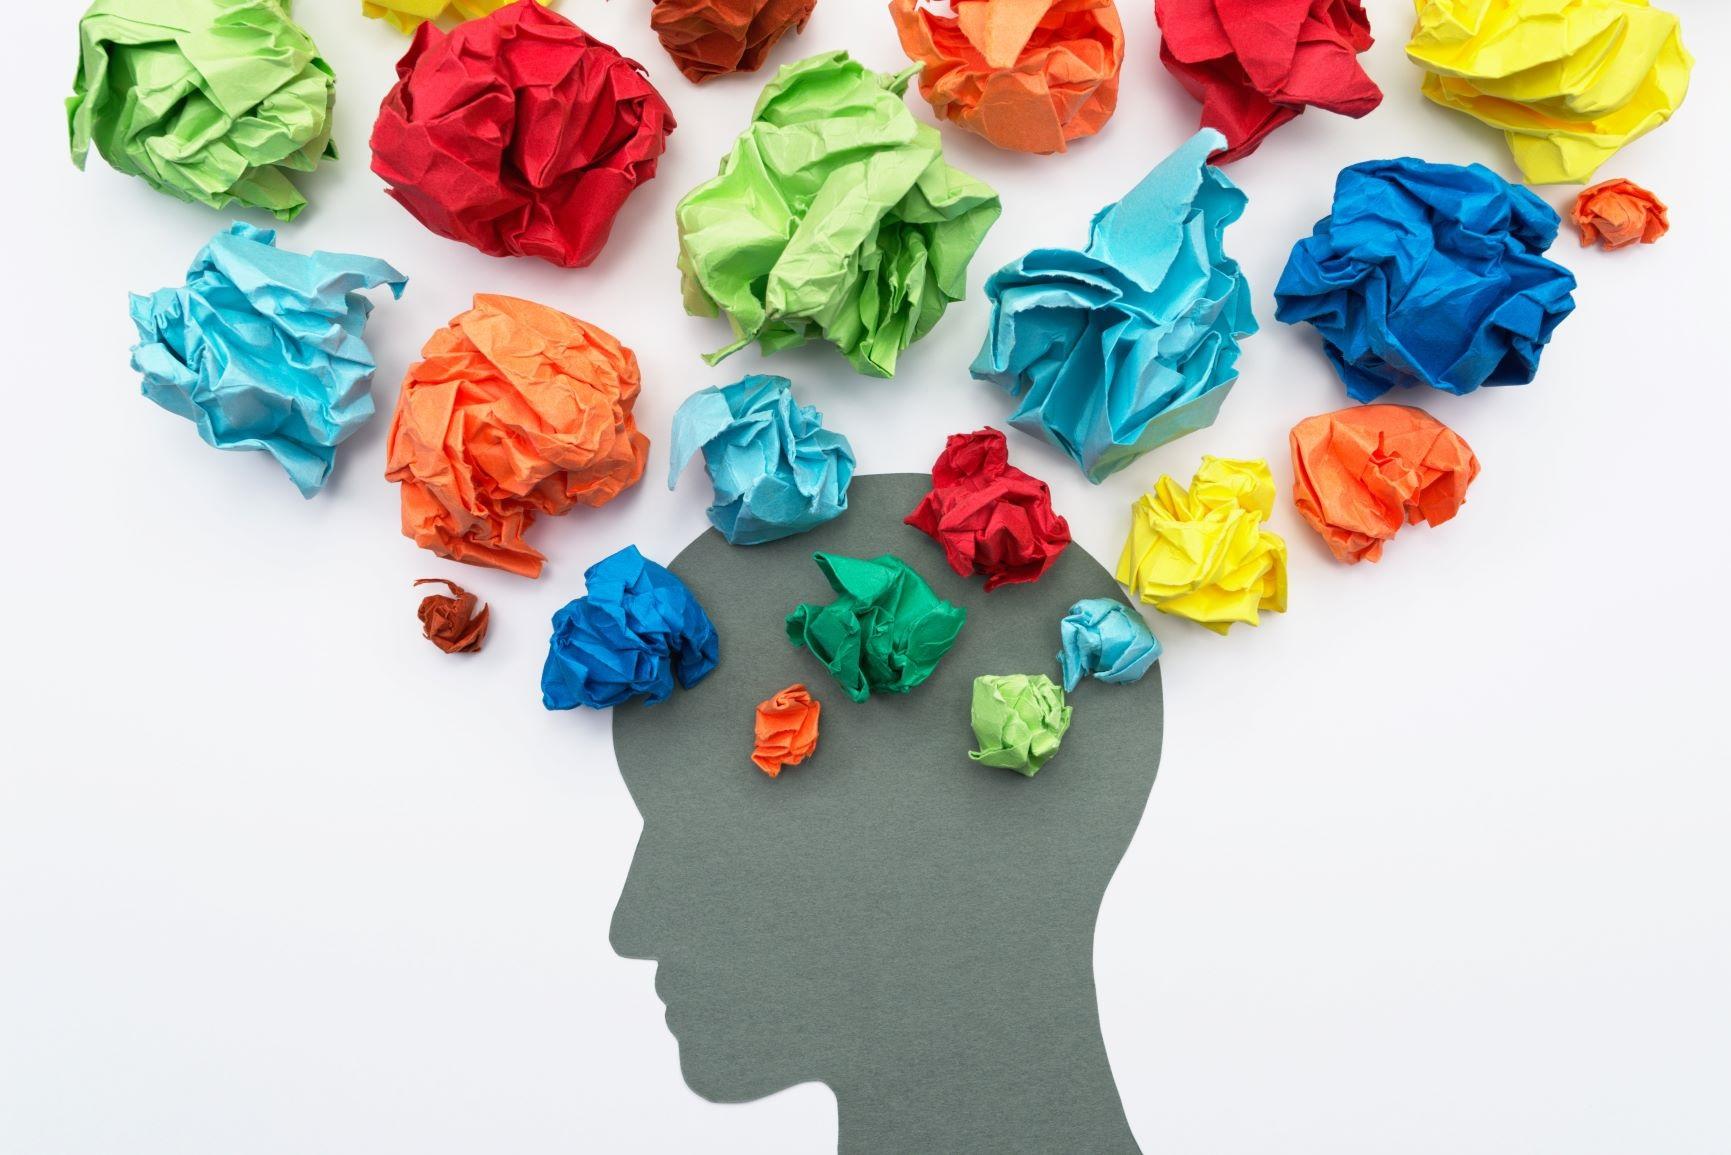 factors that affect mental health